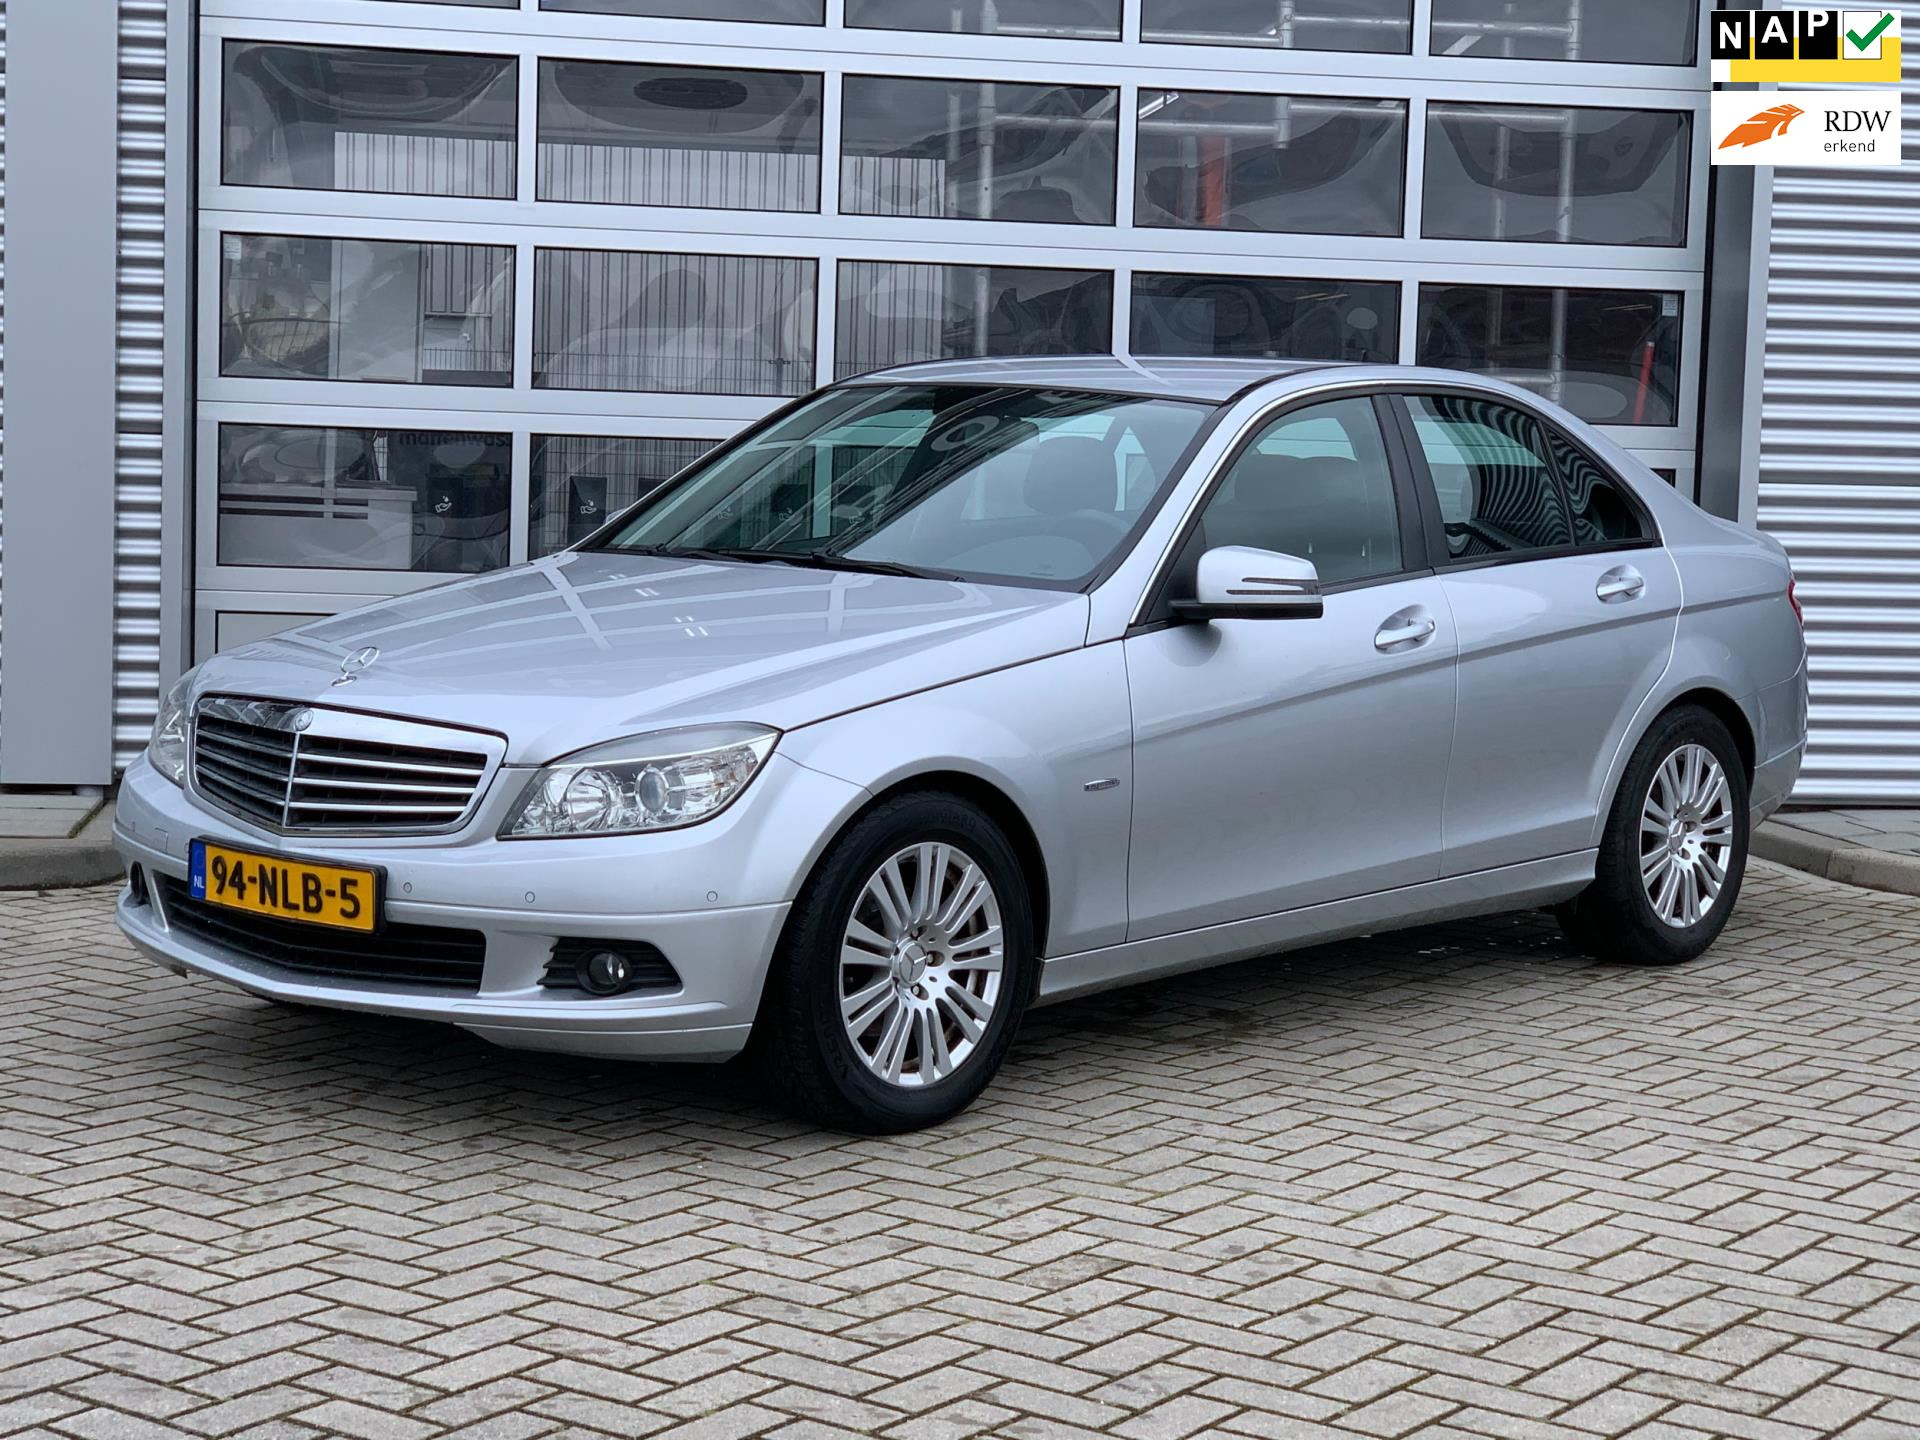 Mercedes-Benz C-klasse occasion - Autobedrijf M. Massop